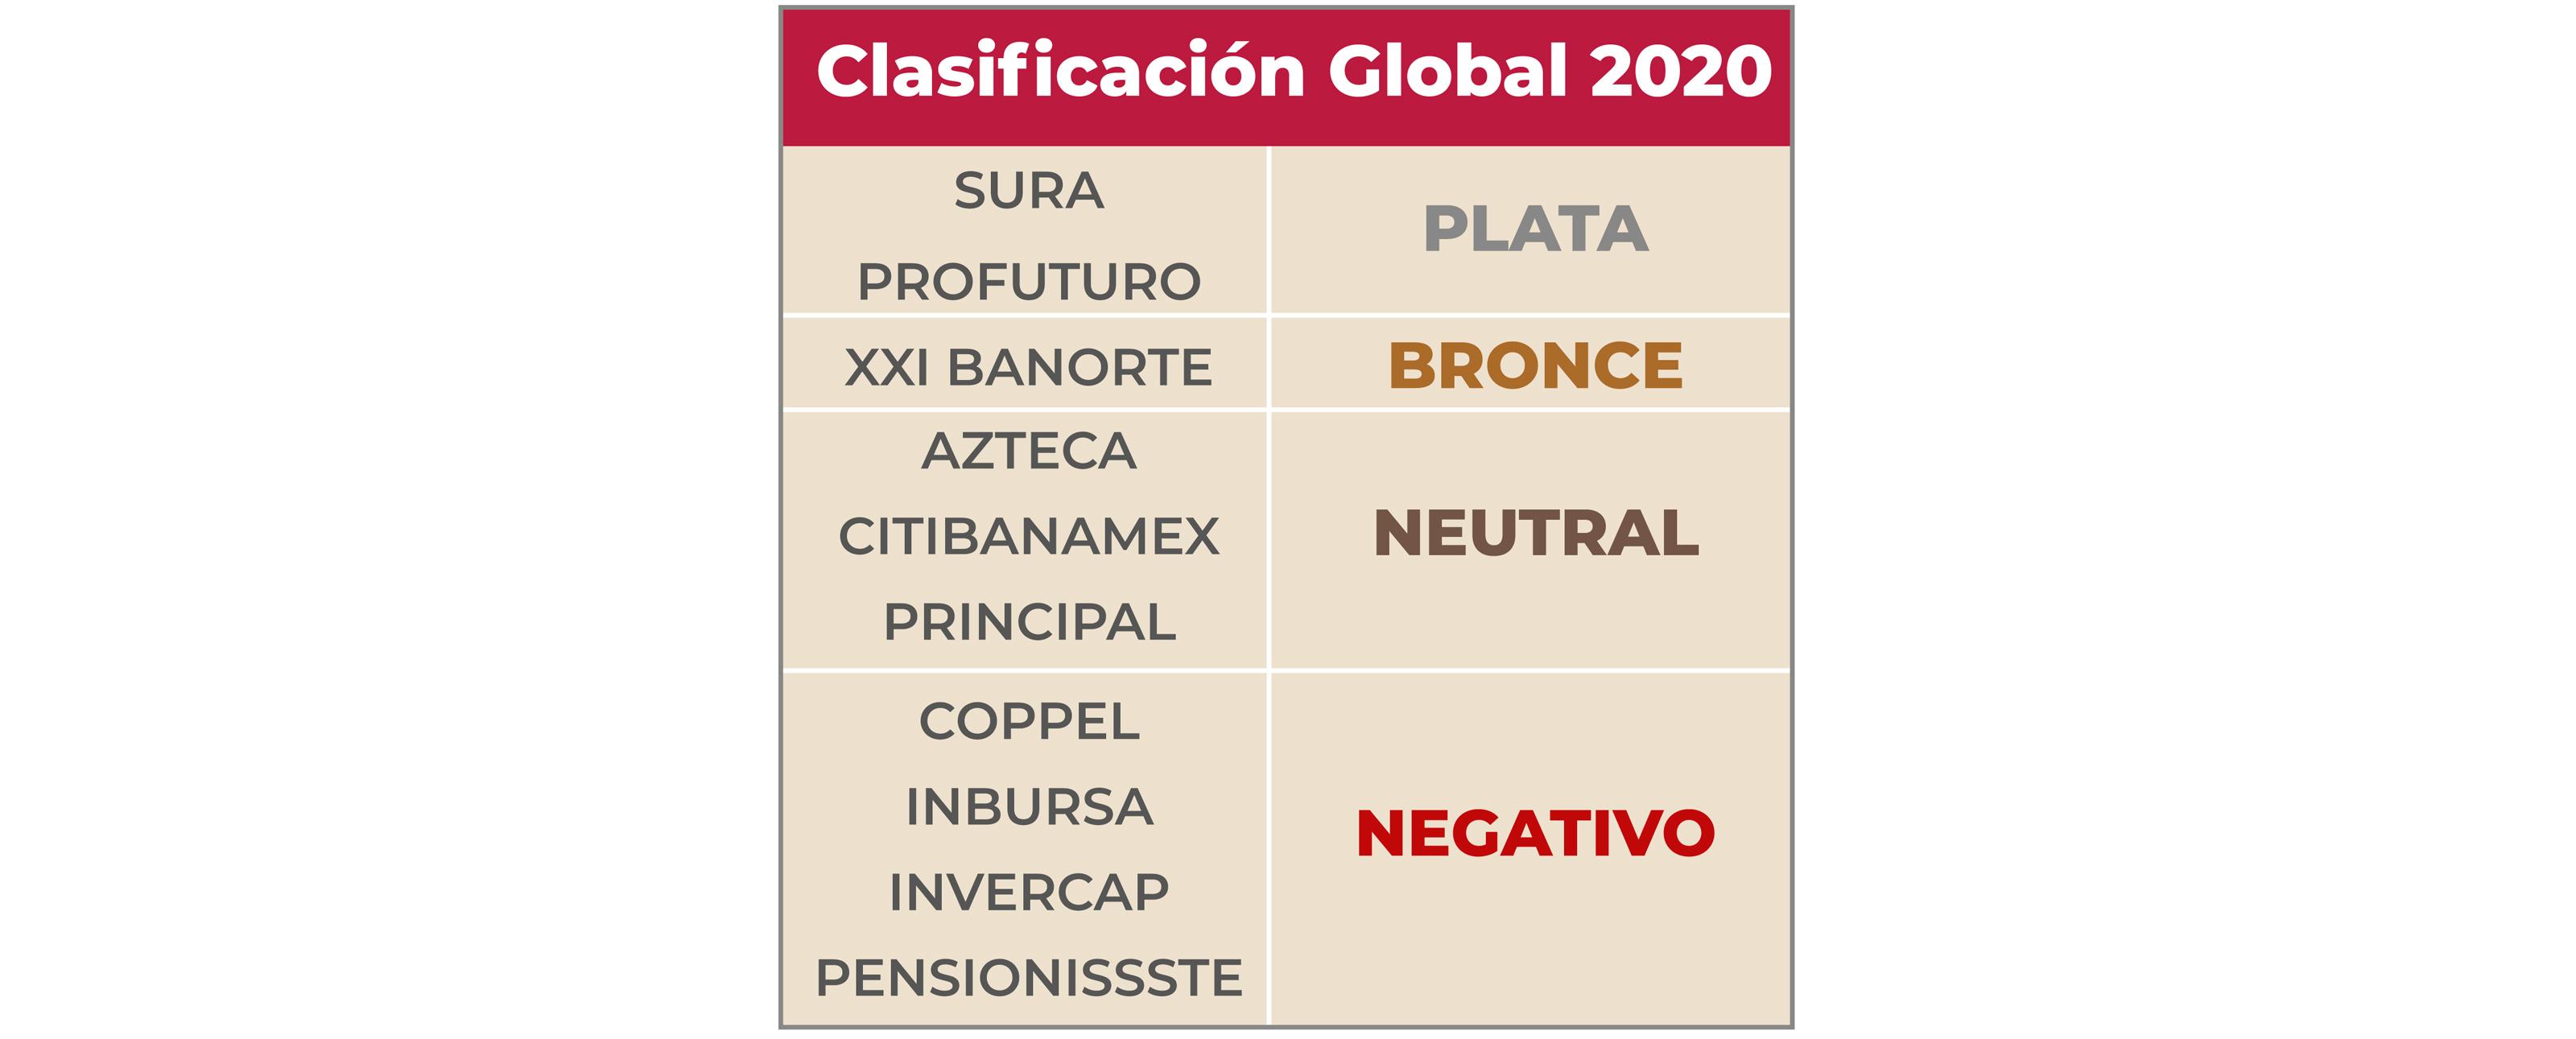 /cms/uploads/image/file/617075/clasif_global_2020-4.jpg